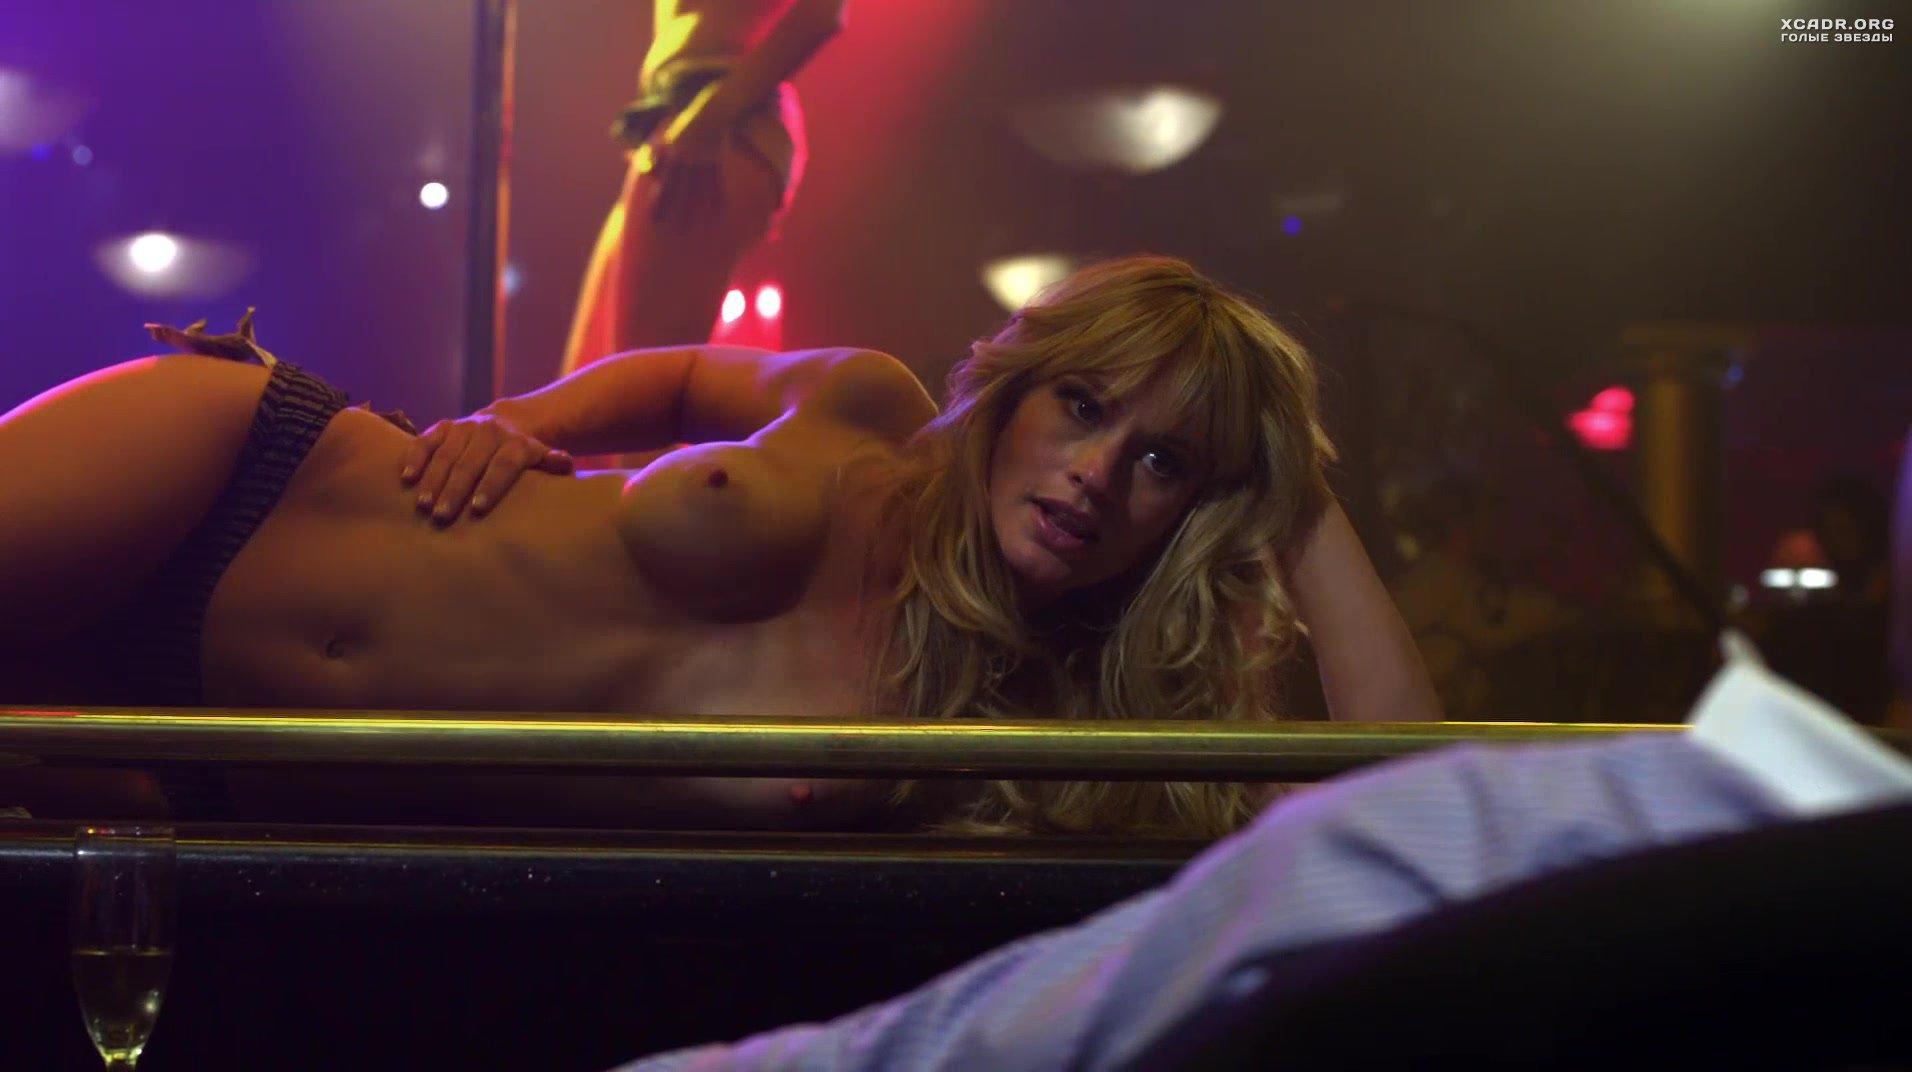 Cameron richardson nude scenes 2